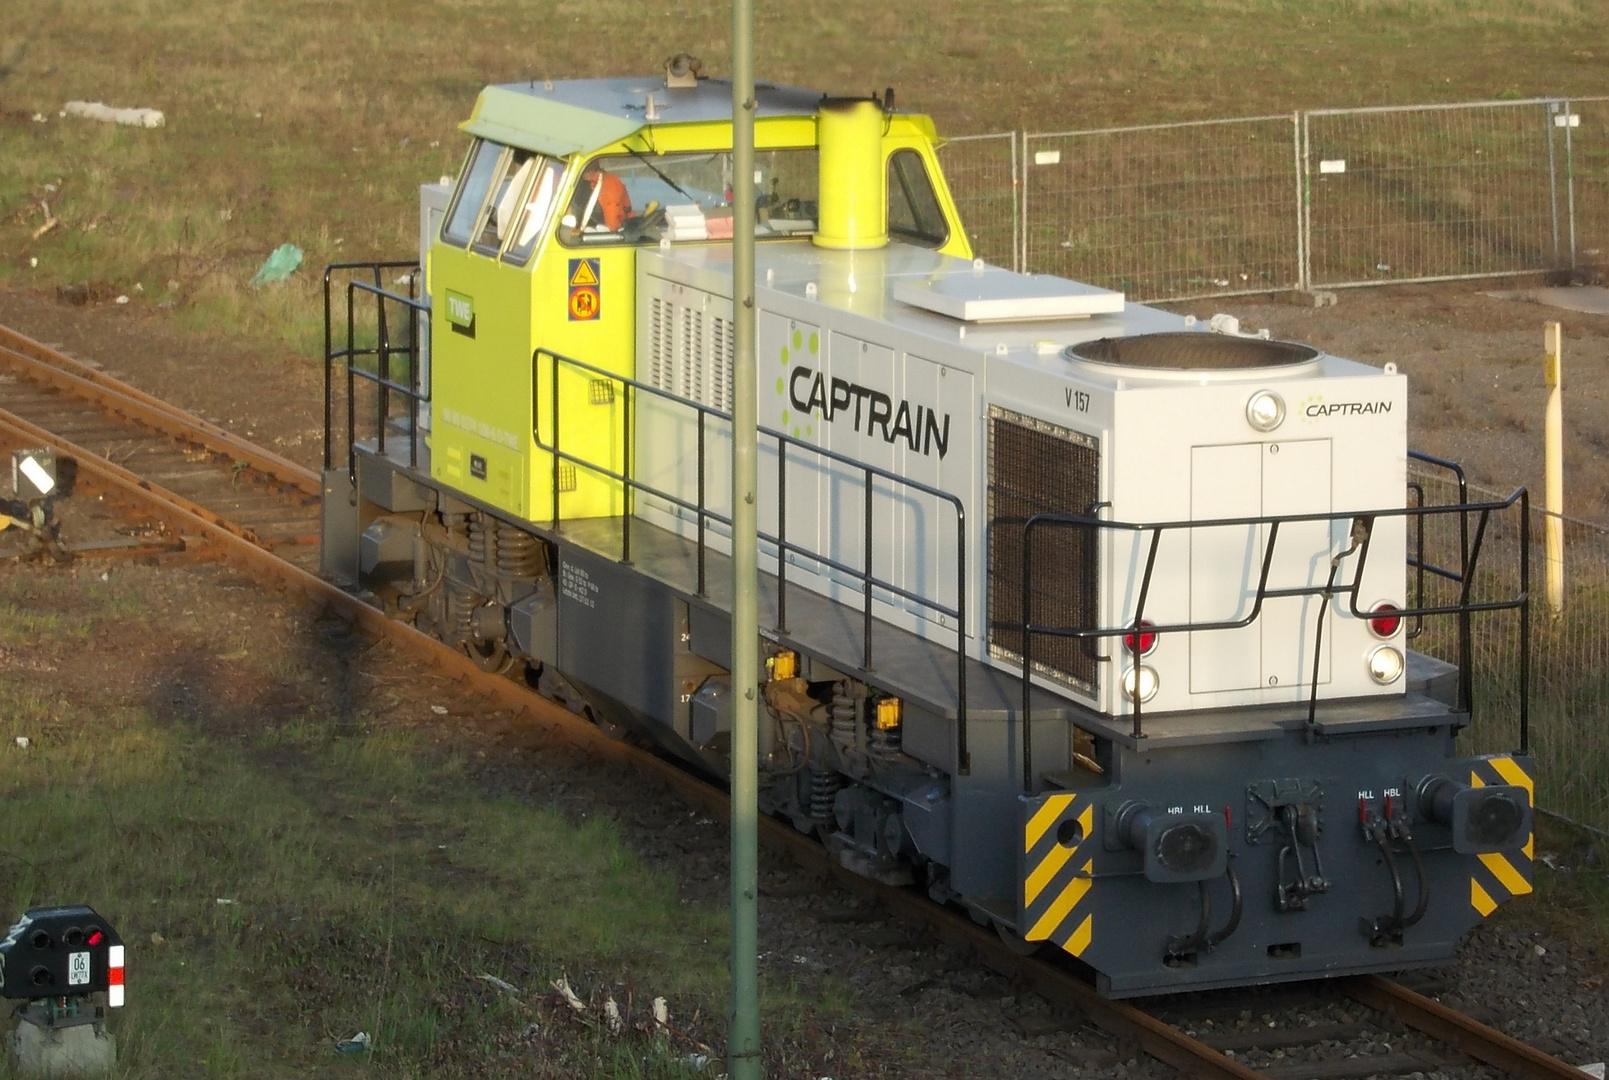 Captrain V 157